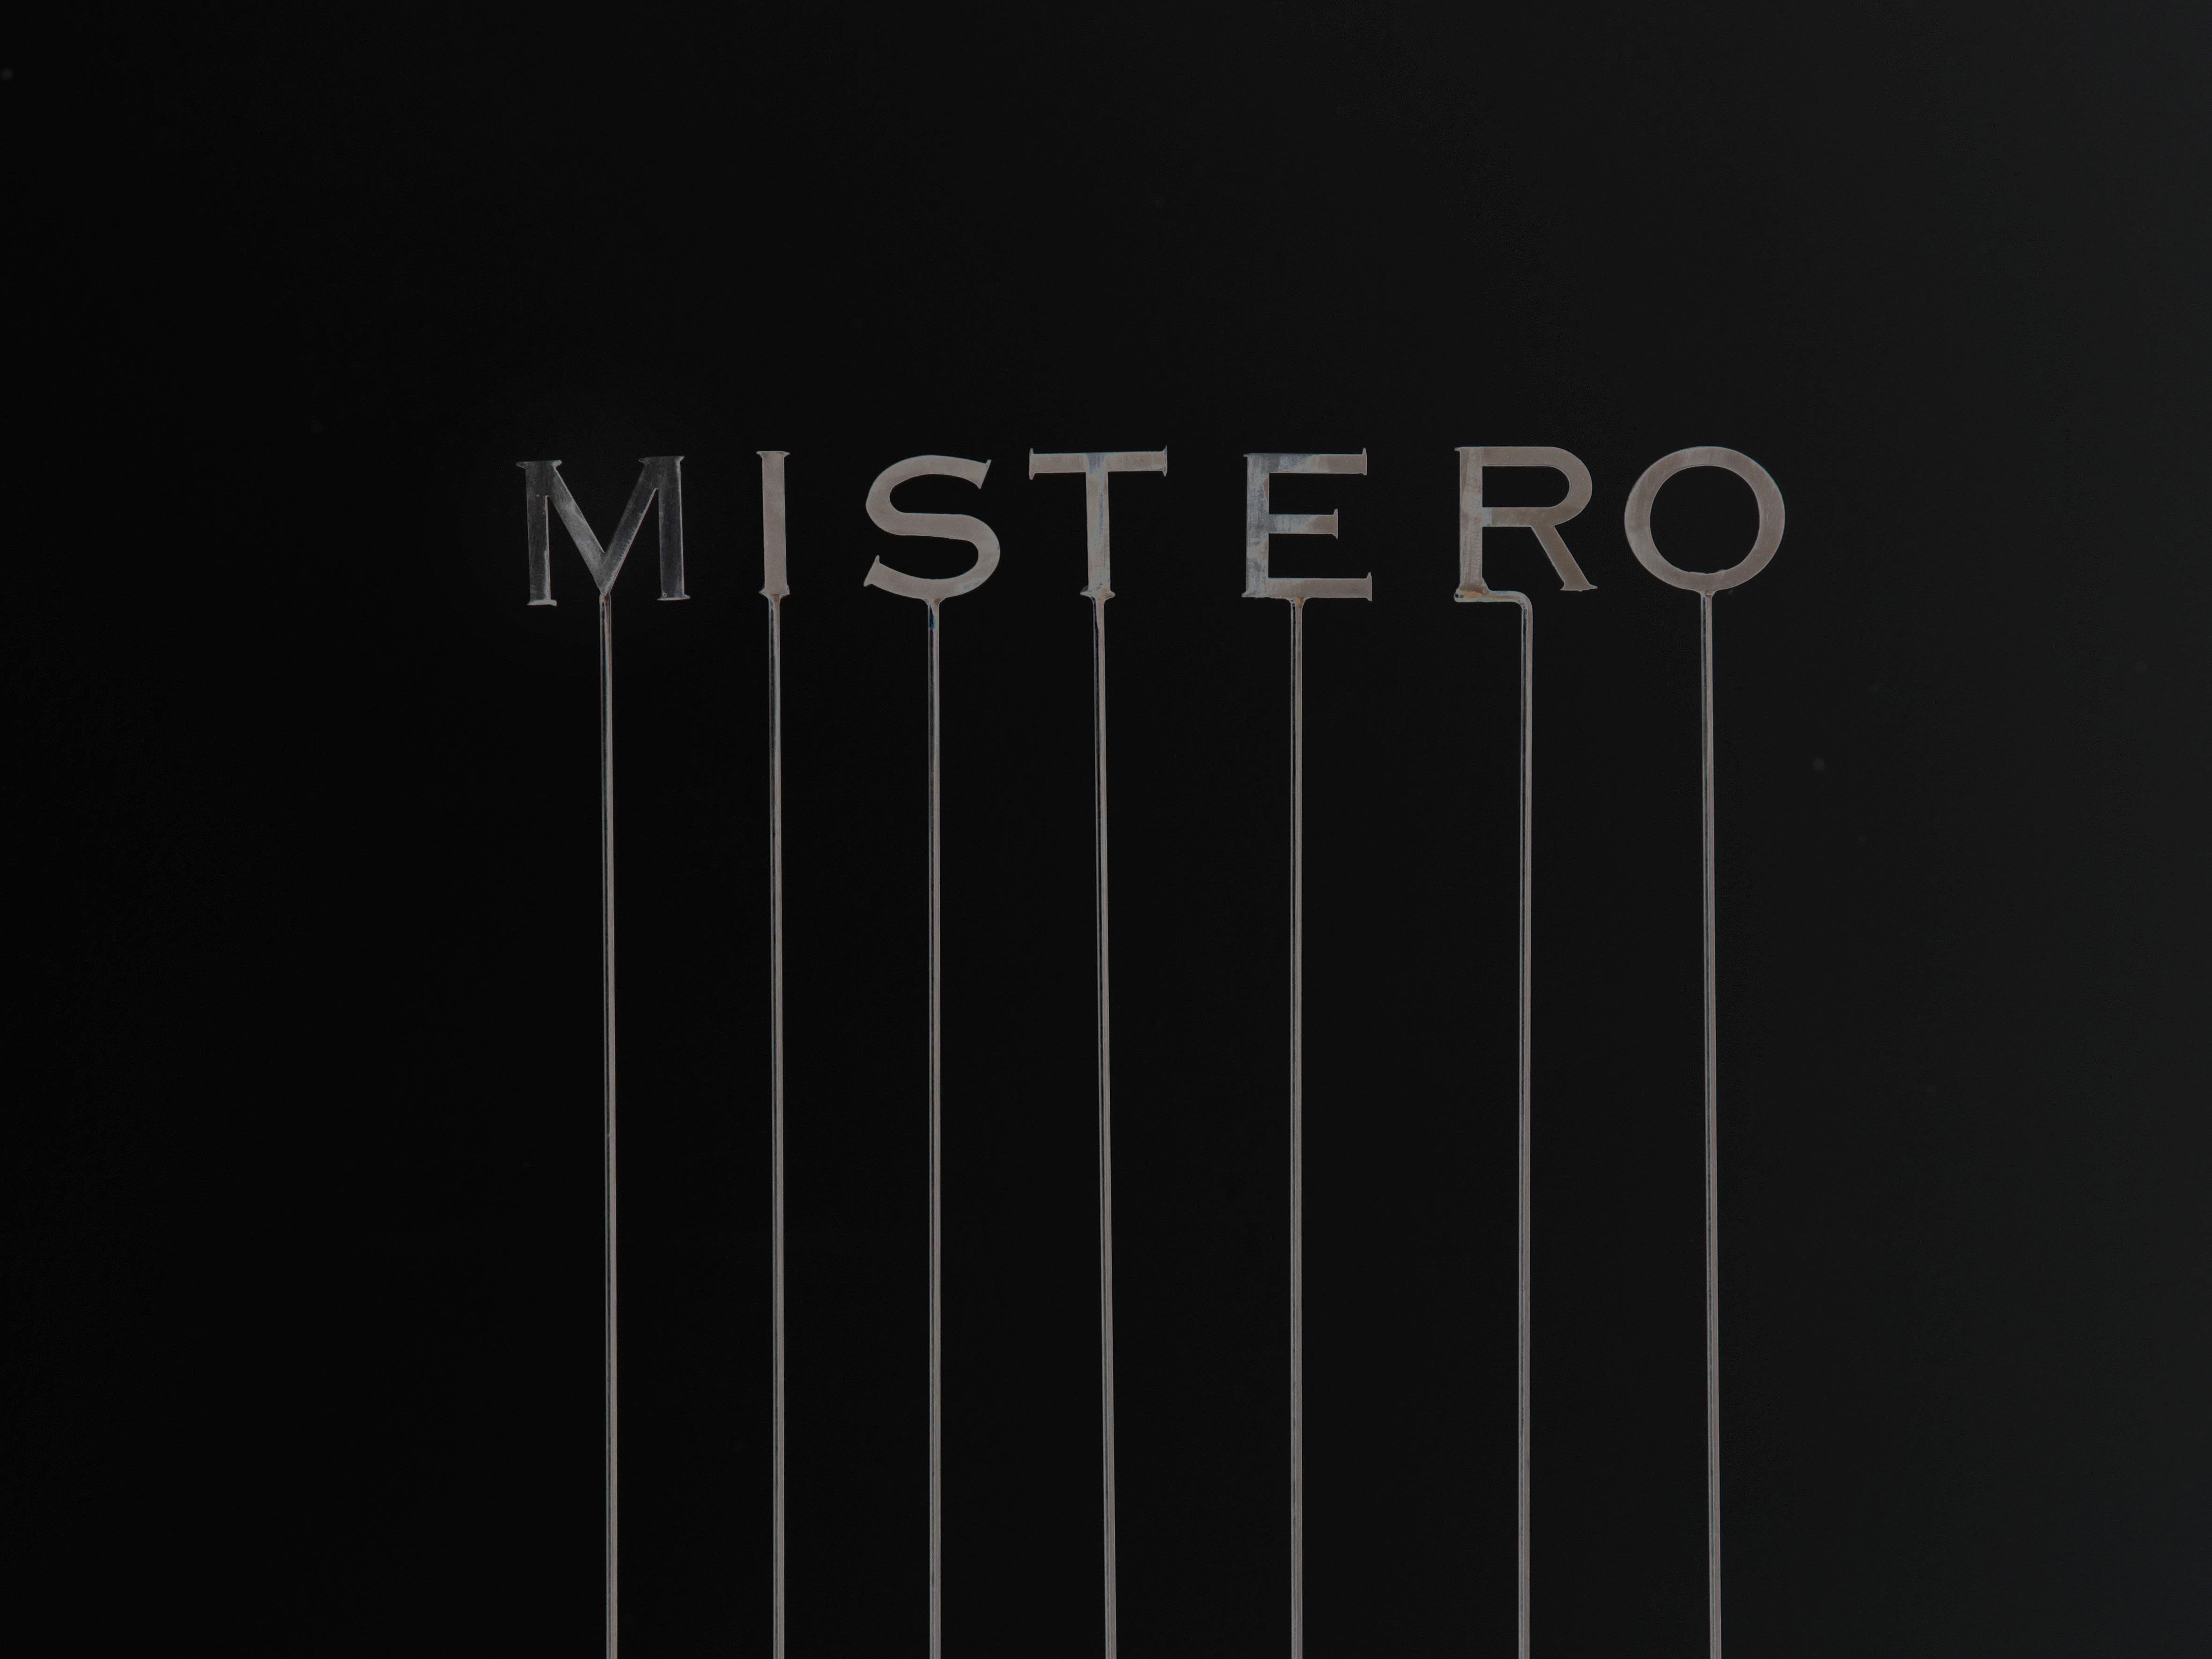 Mystero, stainless steel, laser cutting, 2013